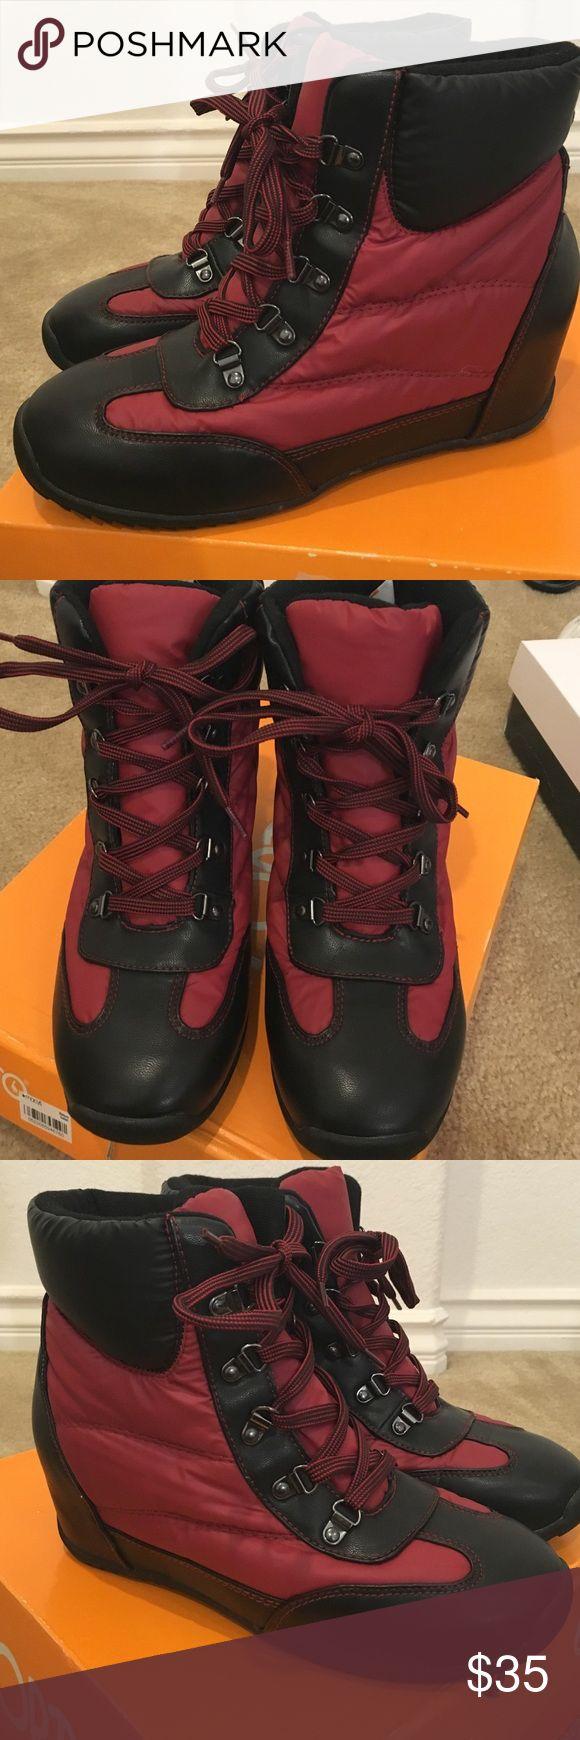 Sporto waterproof winter wedge ankle boots😍 So cute and stylish winter boots. Waterproof. Wedge inside. Comes in original sporto box. In excellent condition! sporto Shoes Winter & Rain Boots